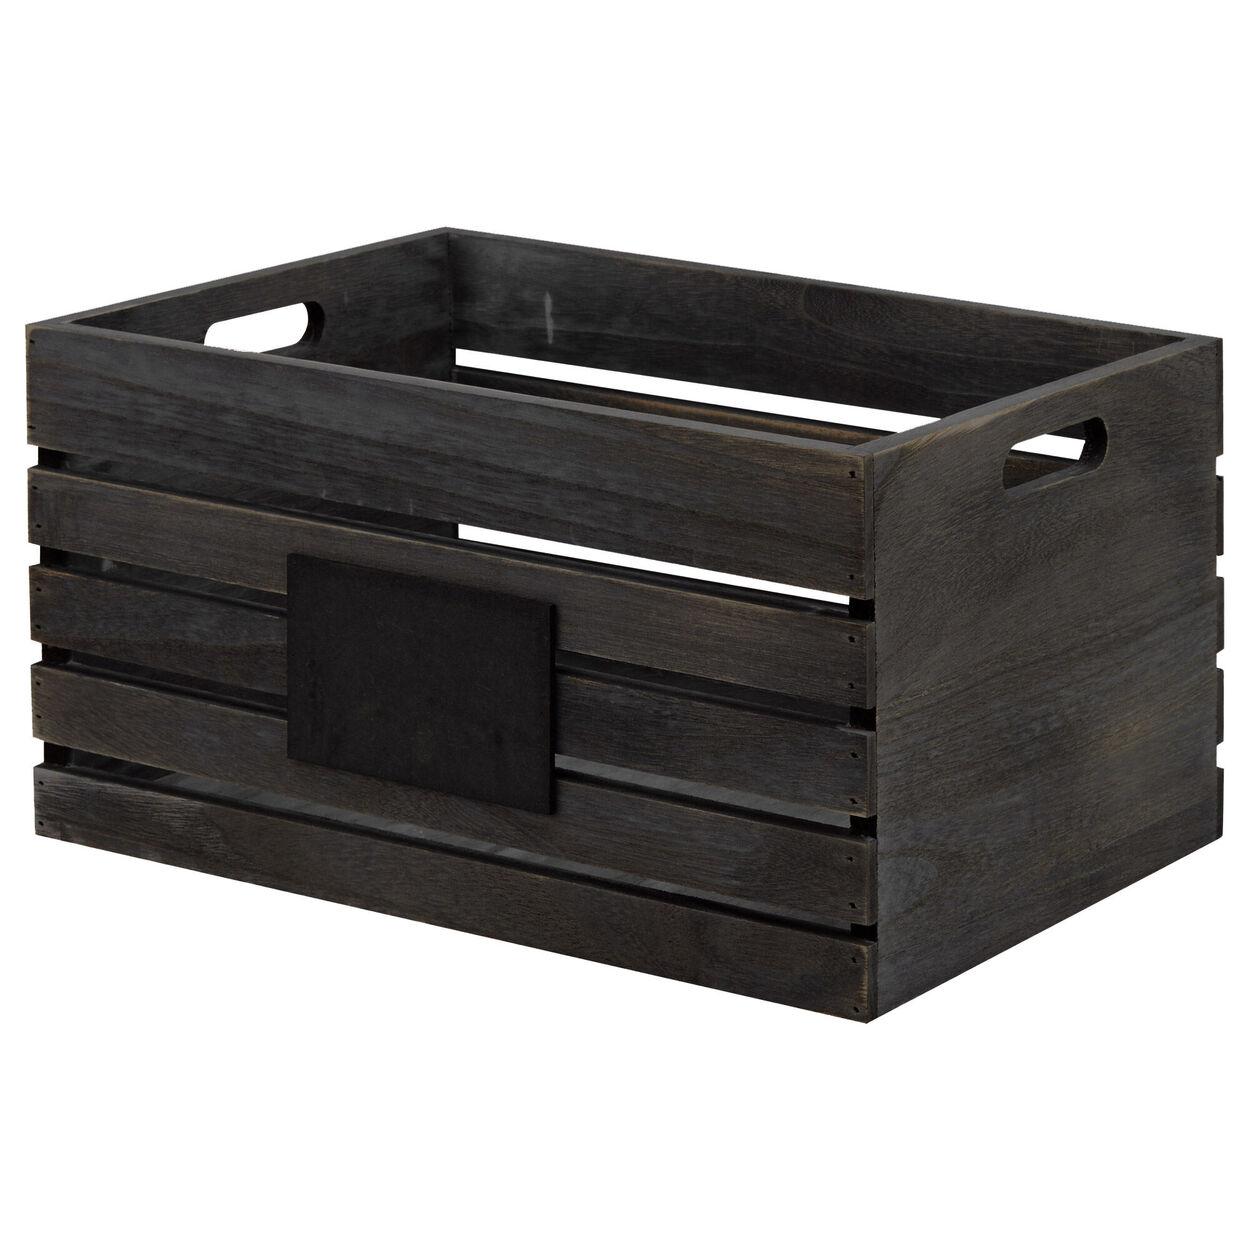 Medium Blackboard Wooden Crate